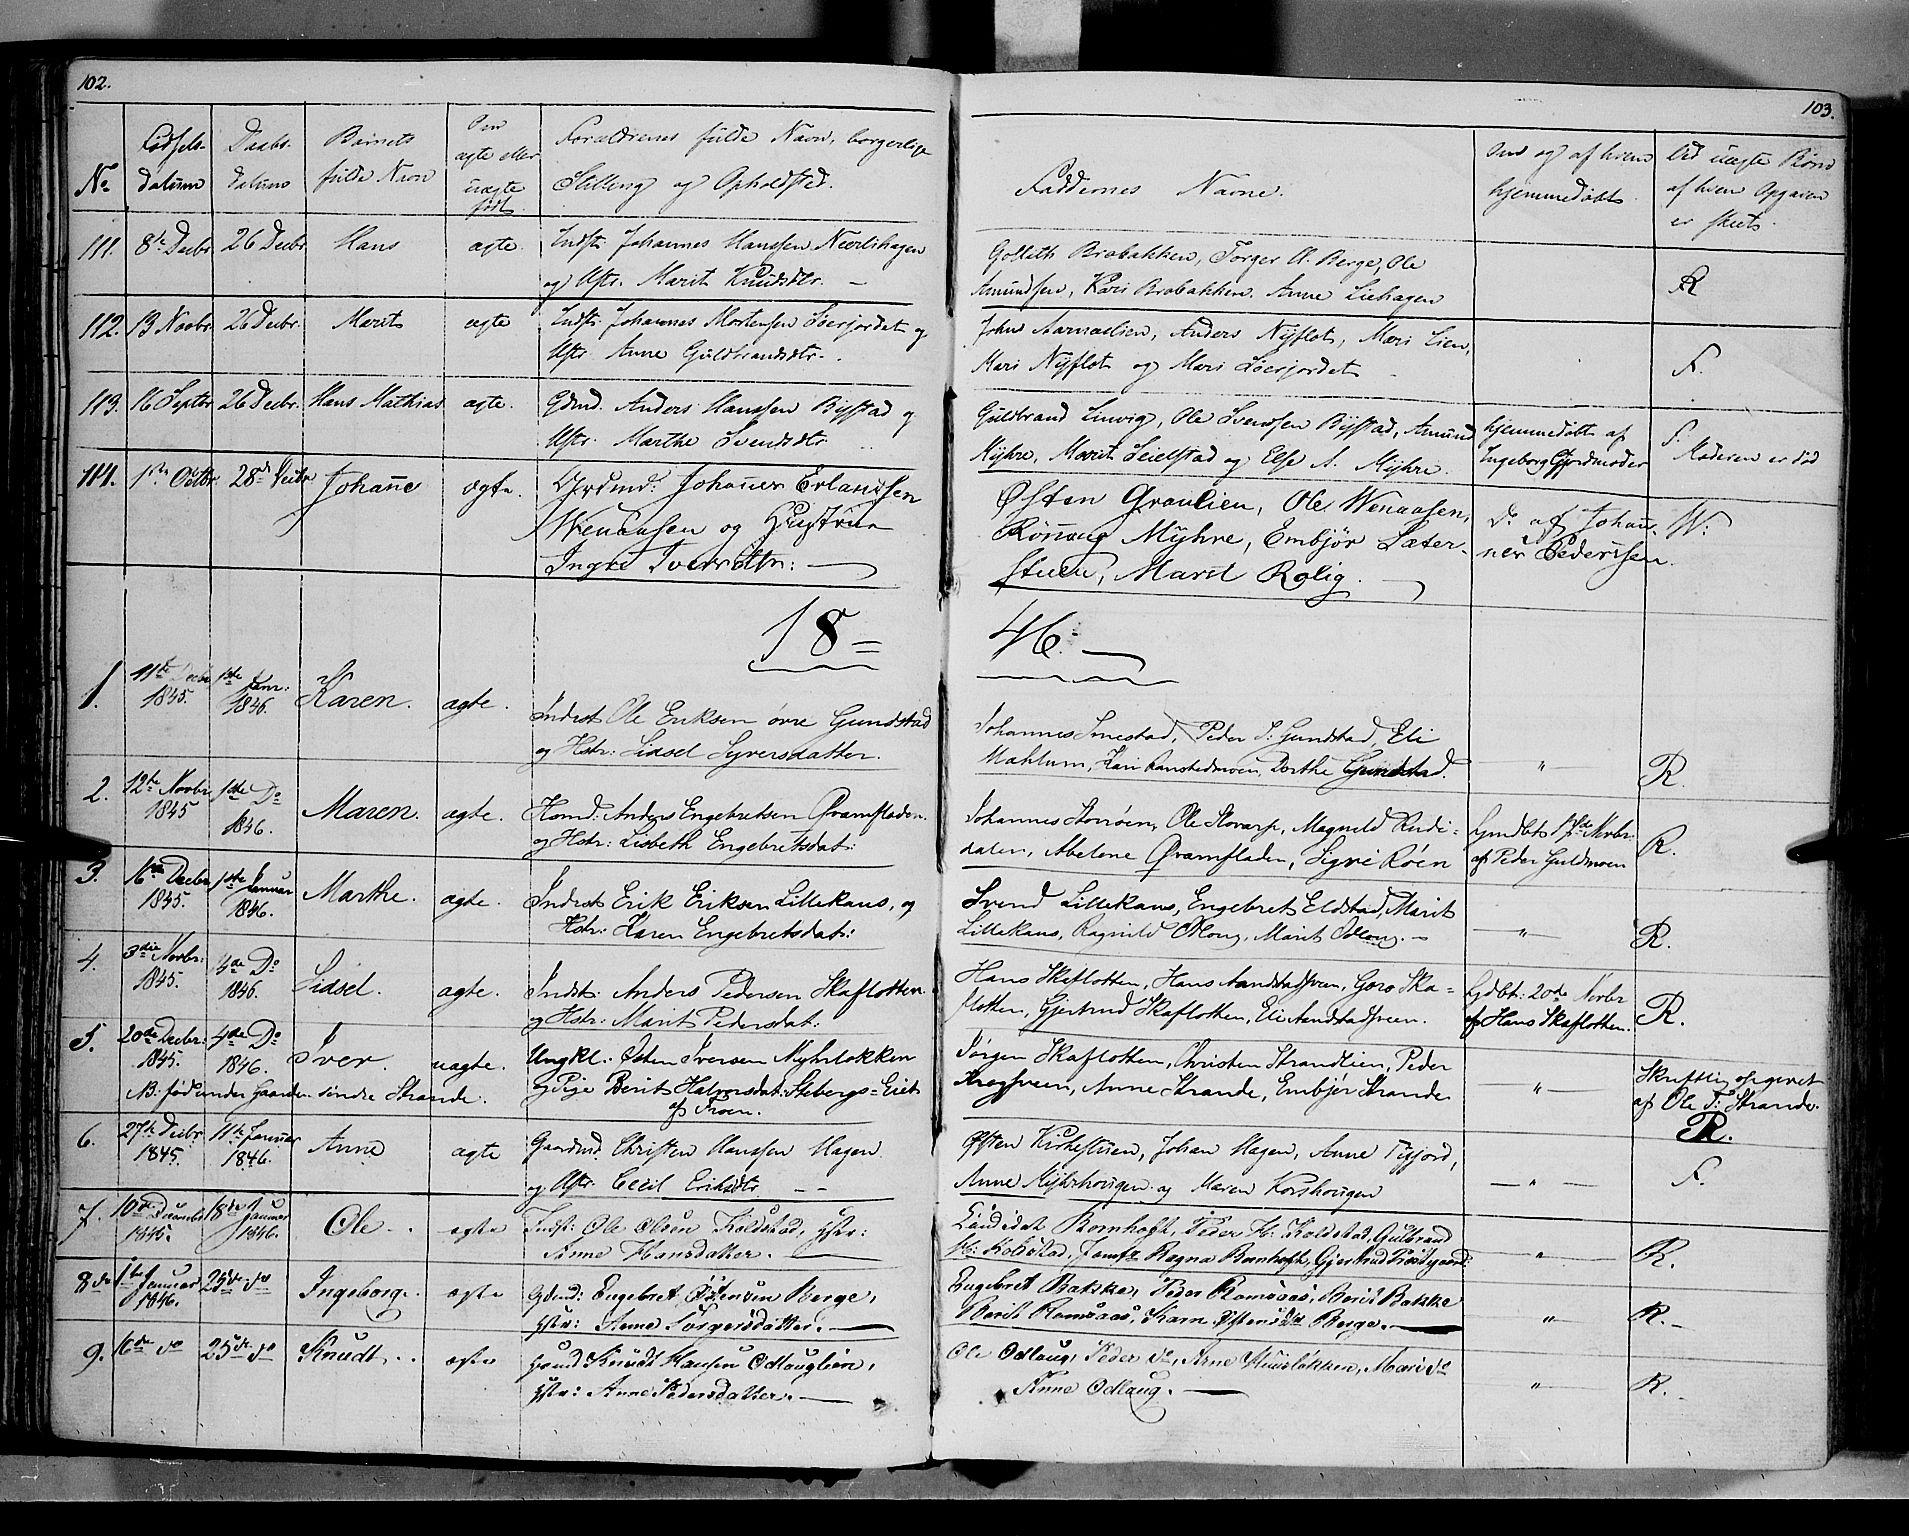 SAH, Ringebu prestekontor, Ministerialbok nr. 5, 1839-1848, s. 102-103